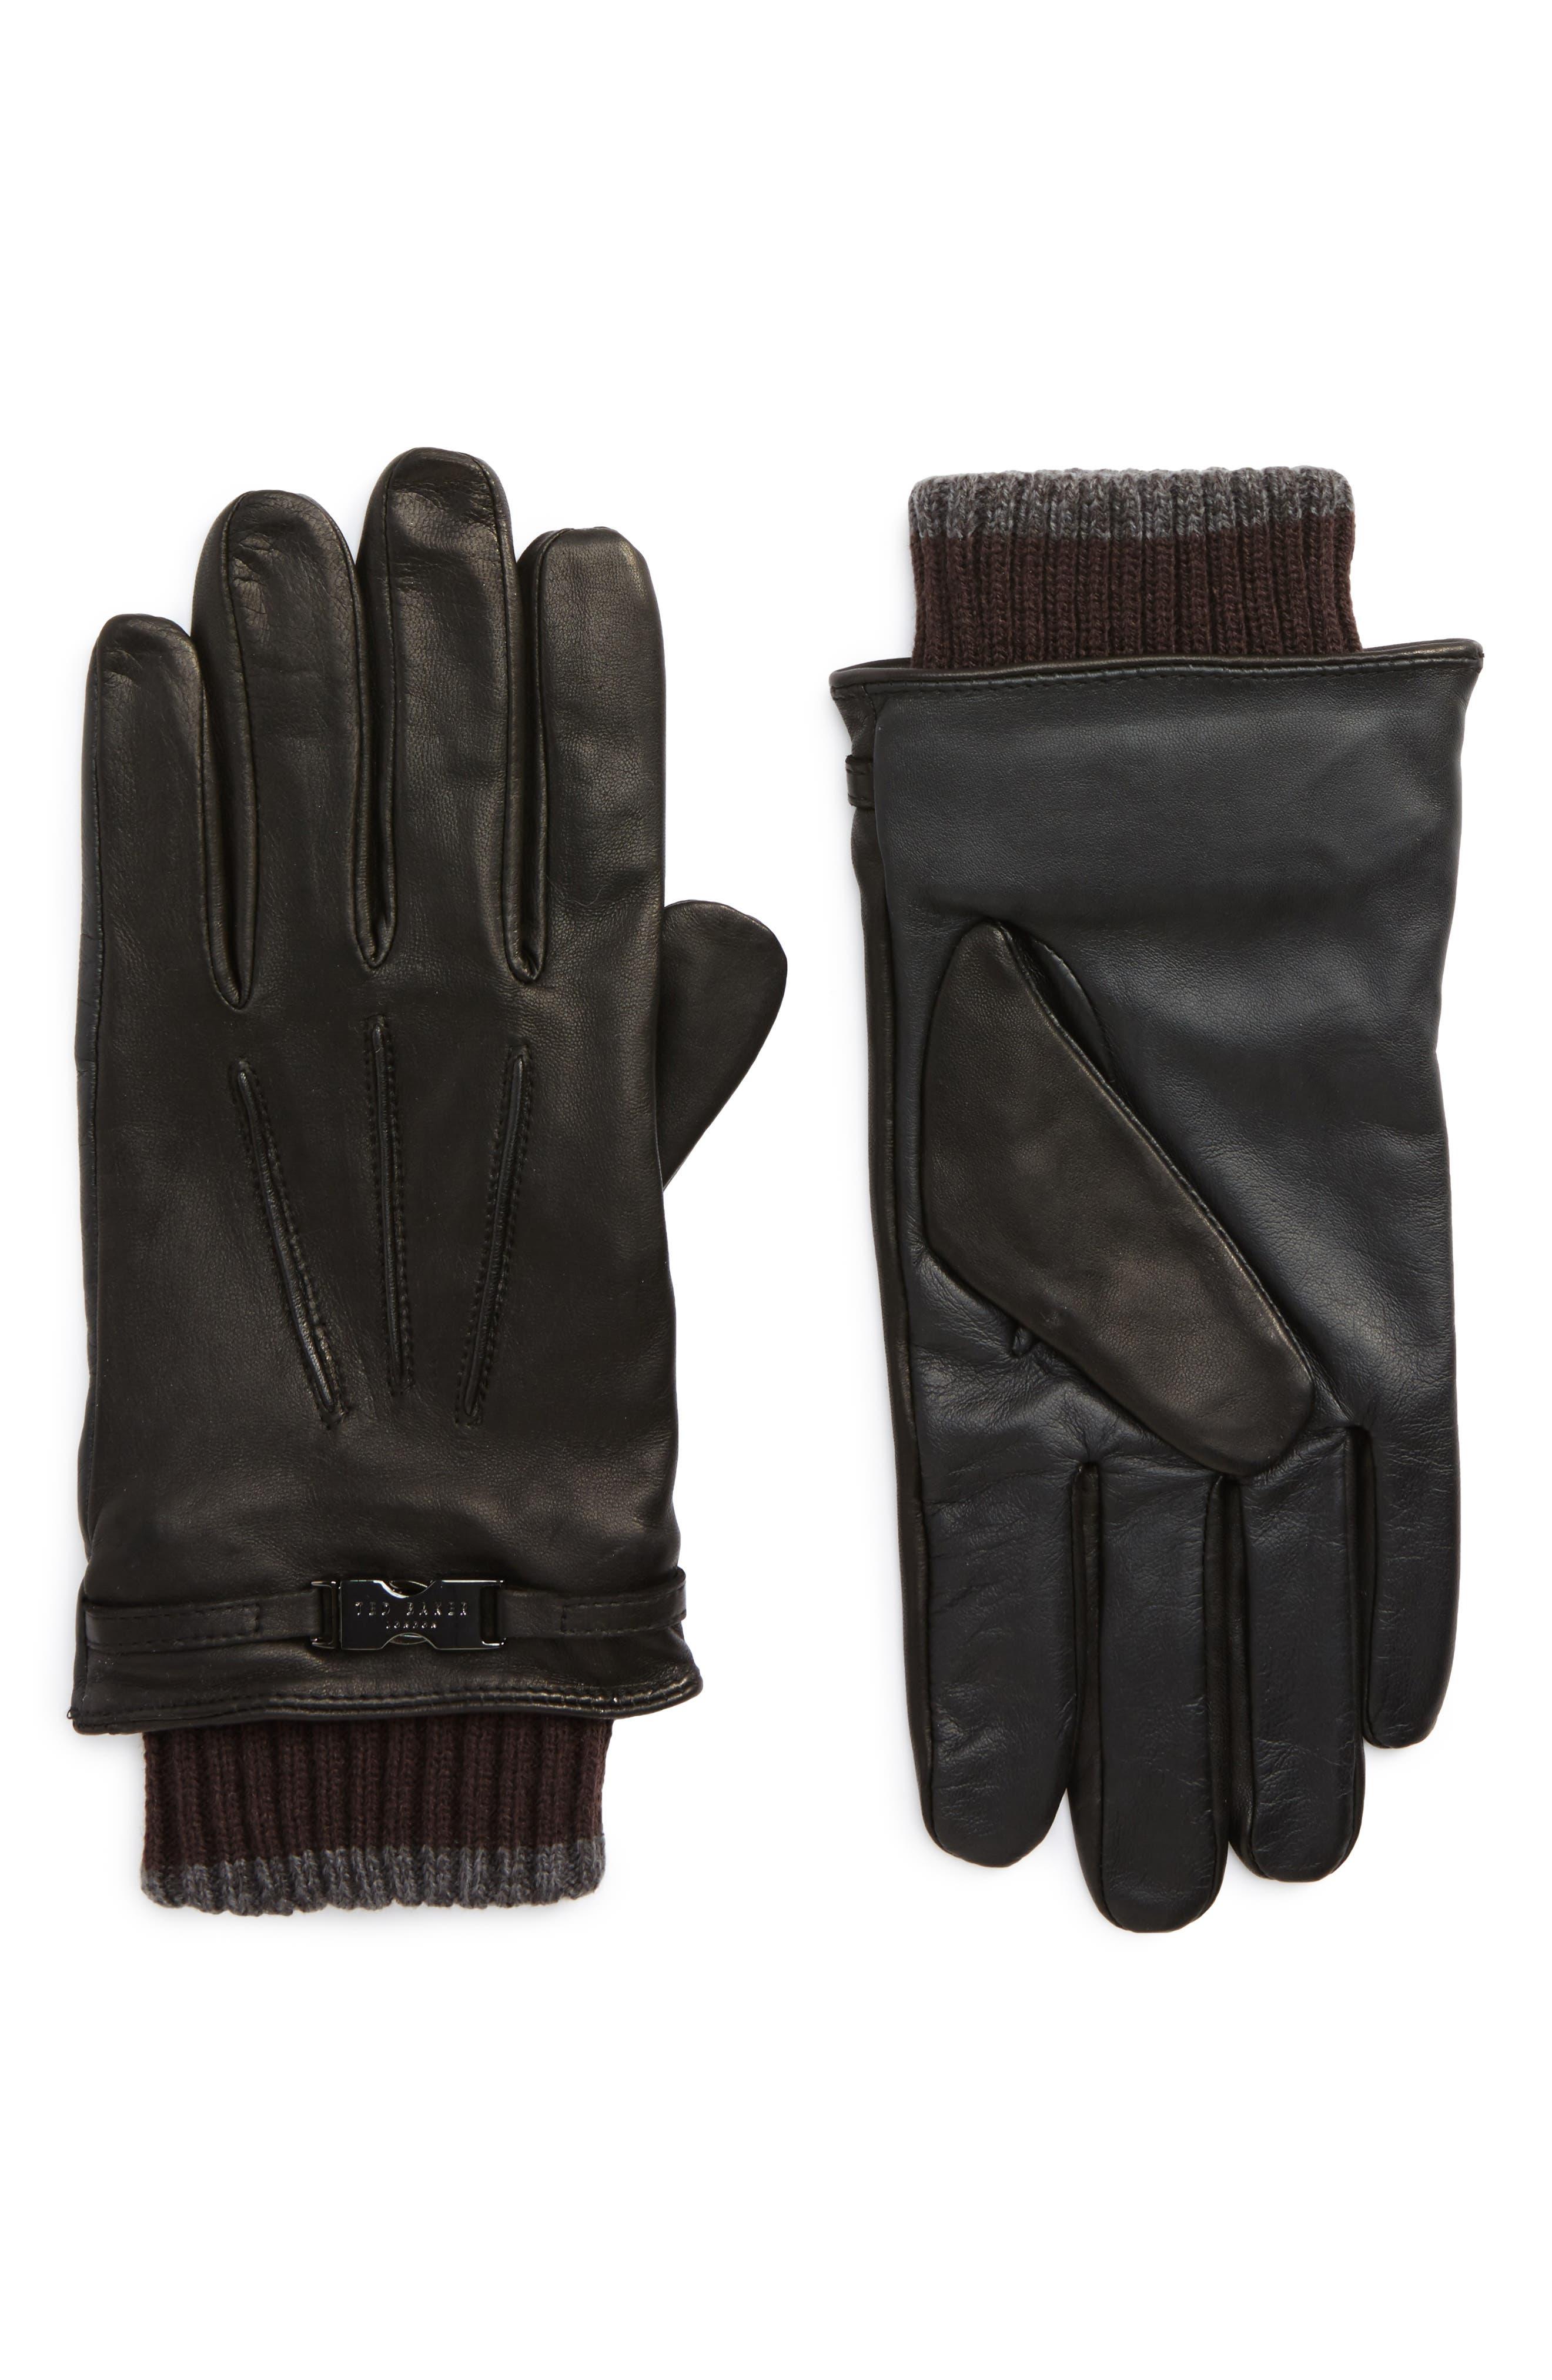 Quiff Leather Gloves,                             Main thumbnail 1, color,                             Black